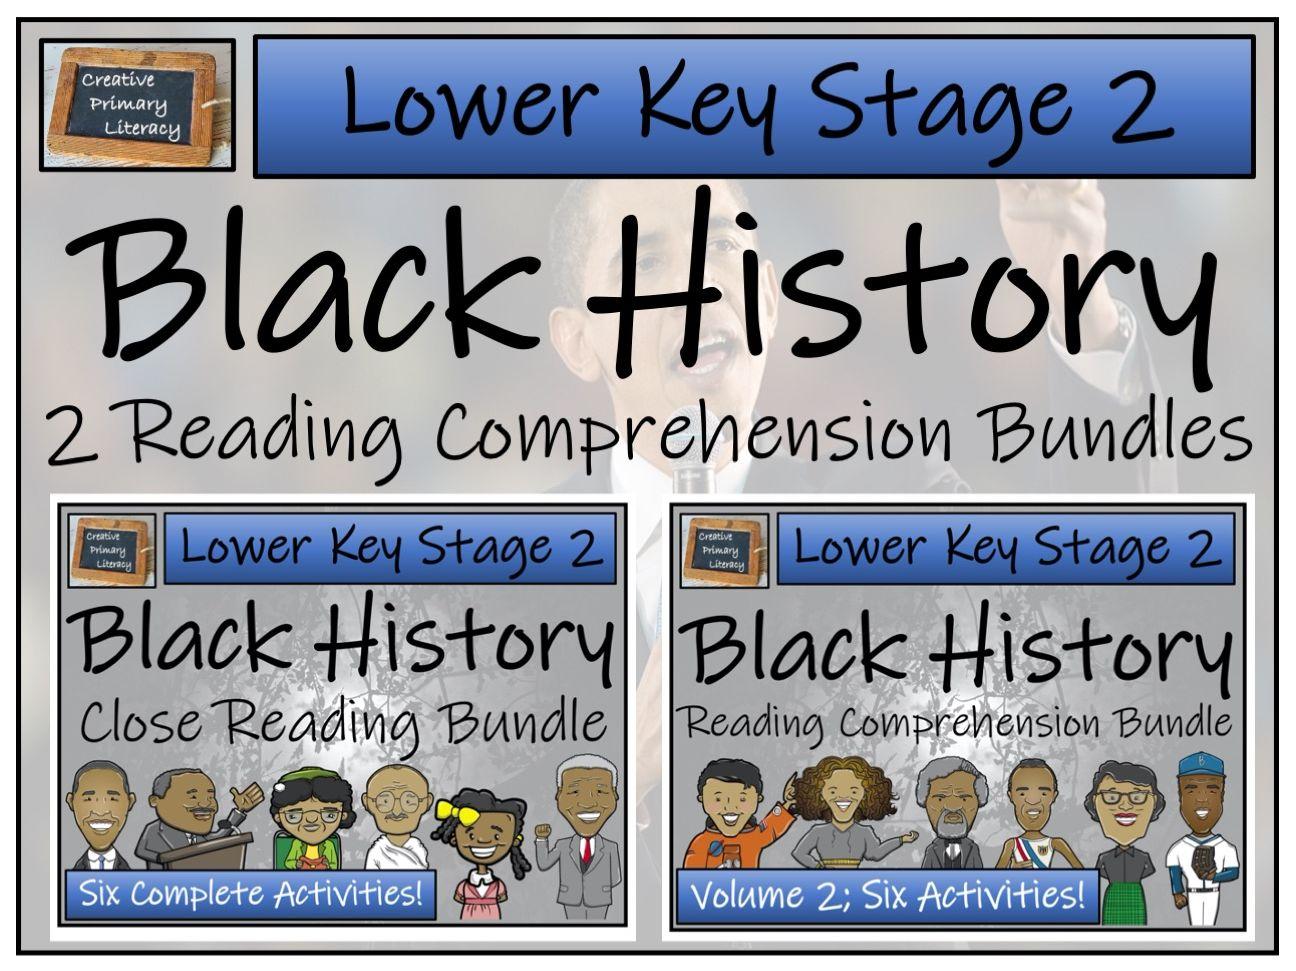 LKS2 Black History Reading Comprehension Bundles Volumes 1 & 2 | Digital & Print